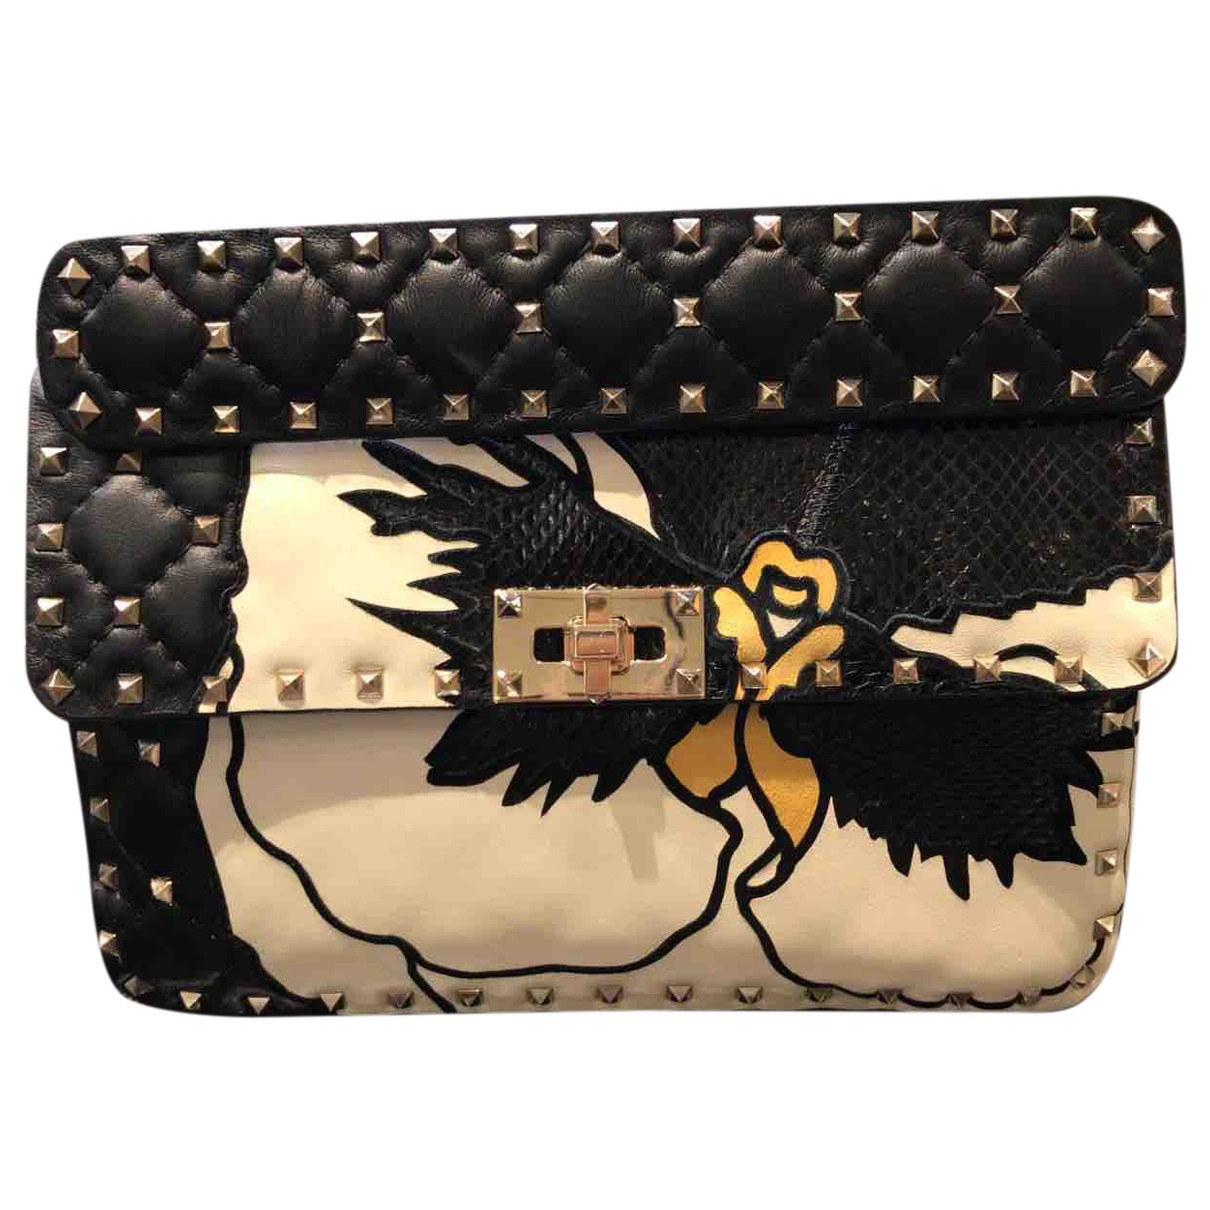 Valentino Garavani Rockstud spike Black Leather handbag for Women N